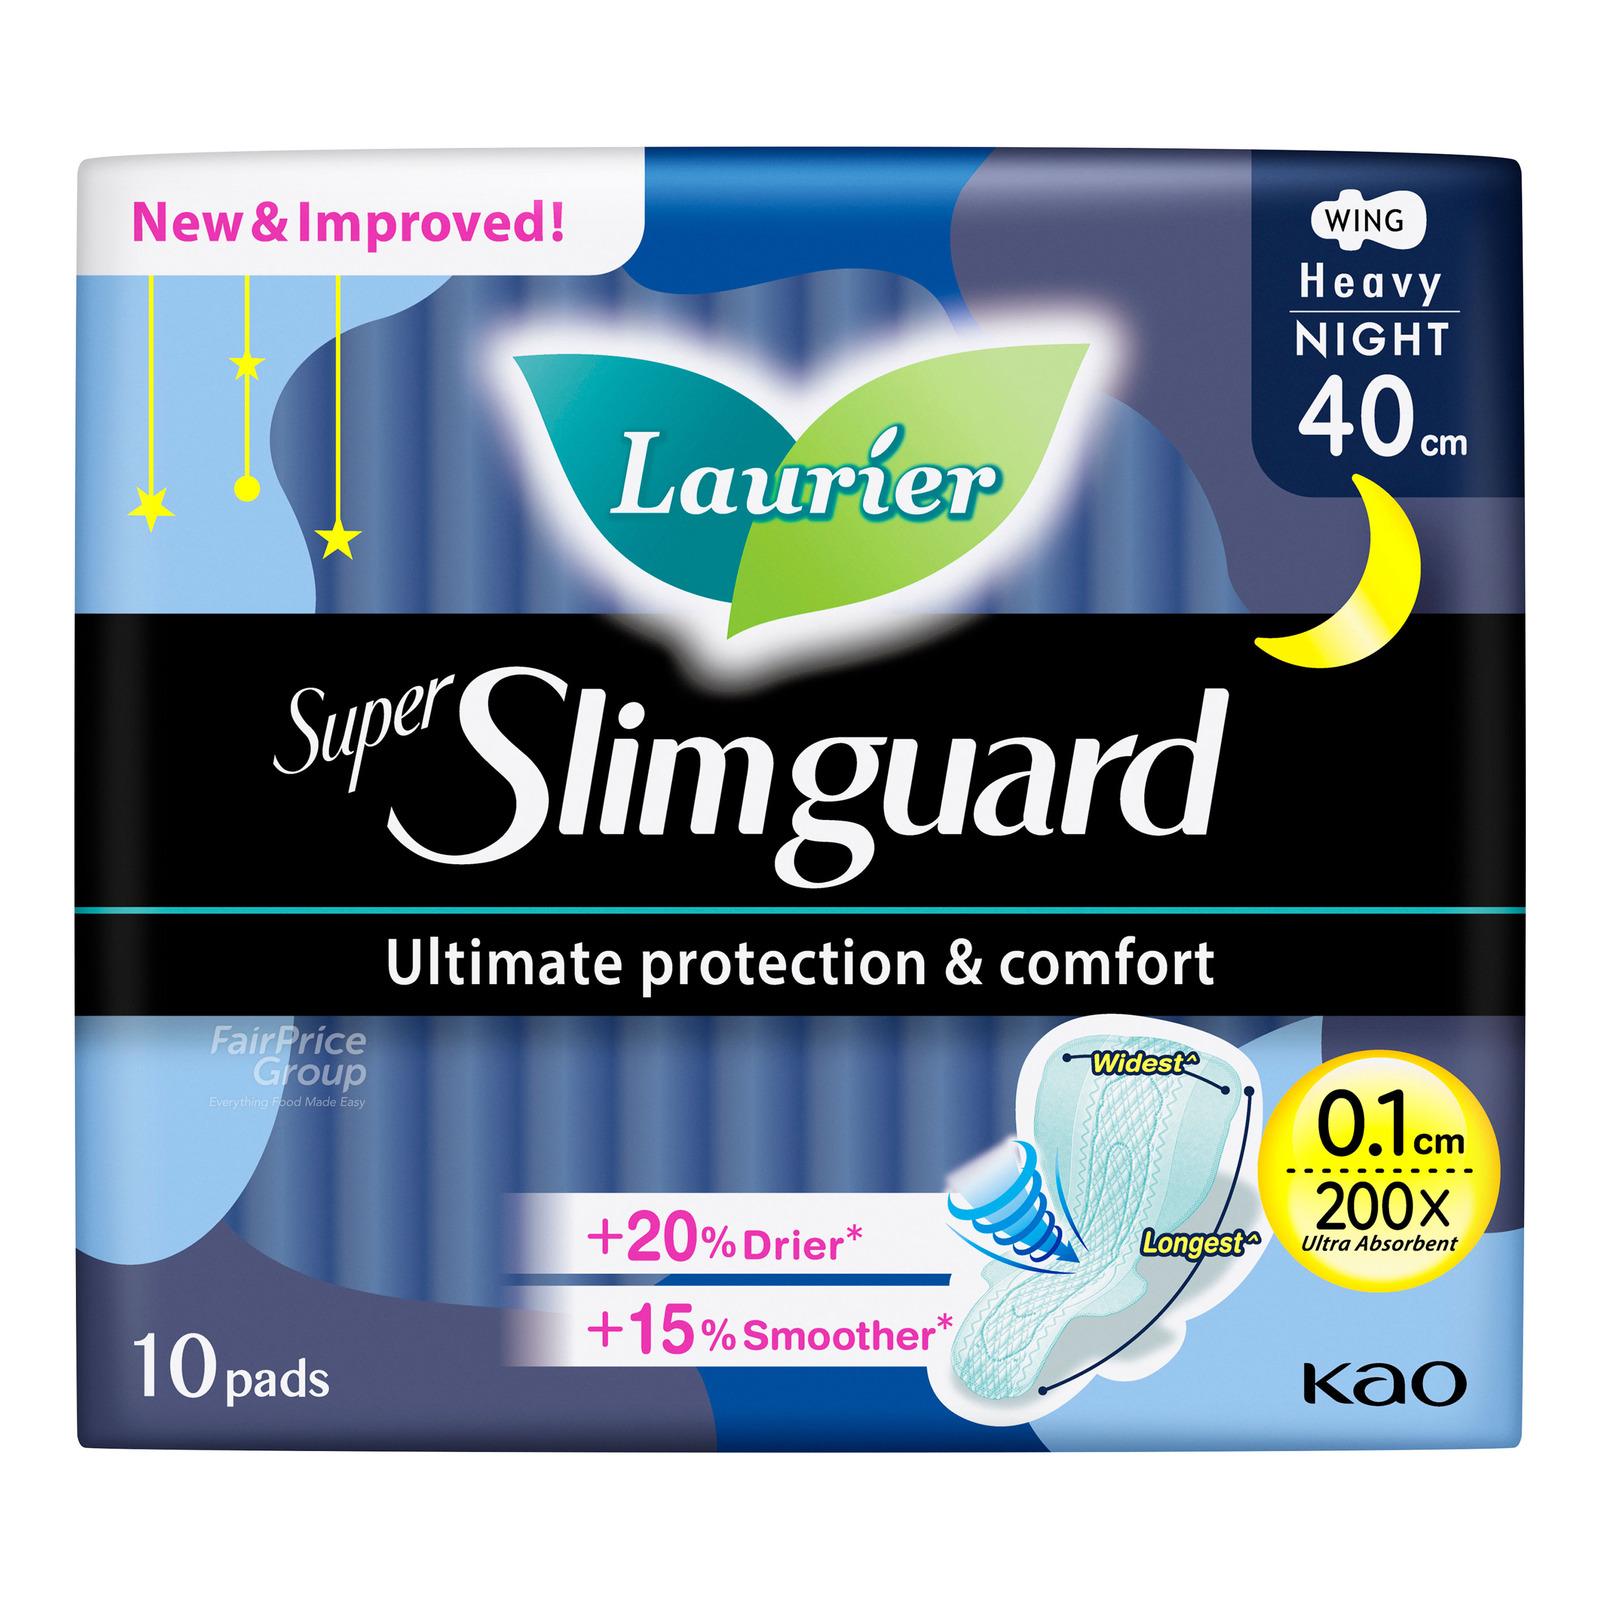 Laurier Super Slimguard Night Pads - Heavy (40cm)